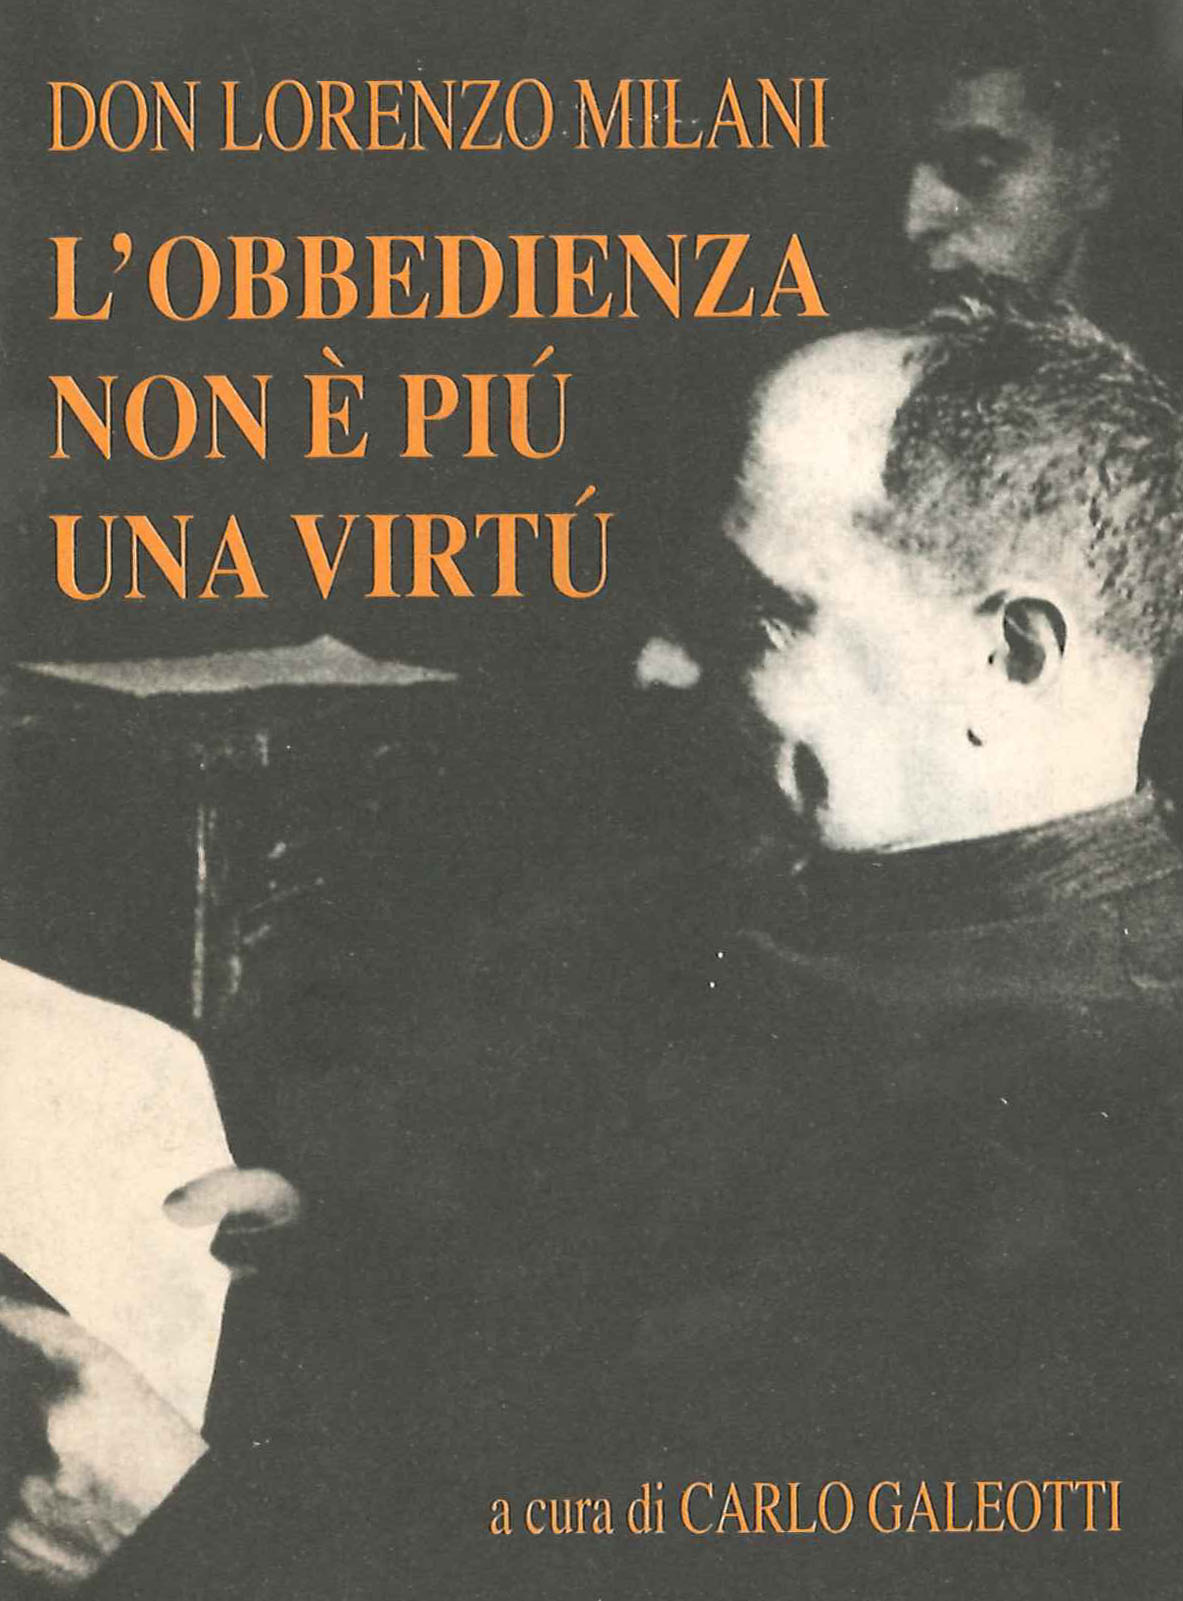 Associazione Don Lorenzo Milani